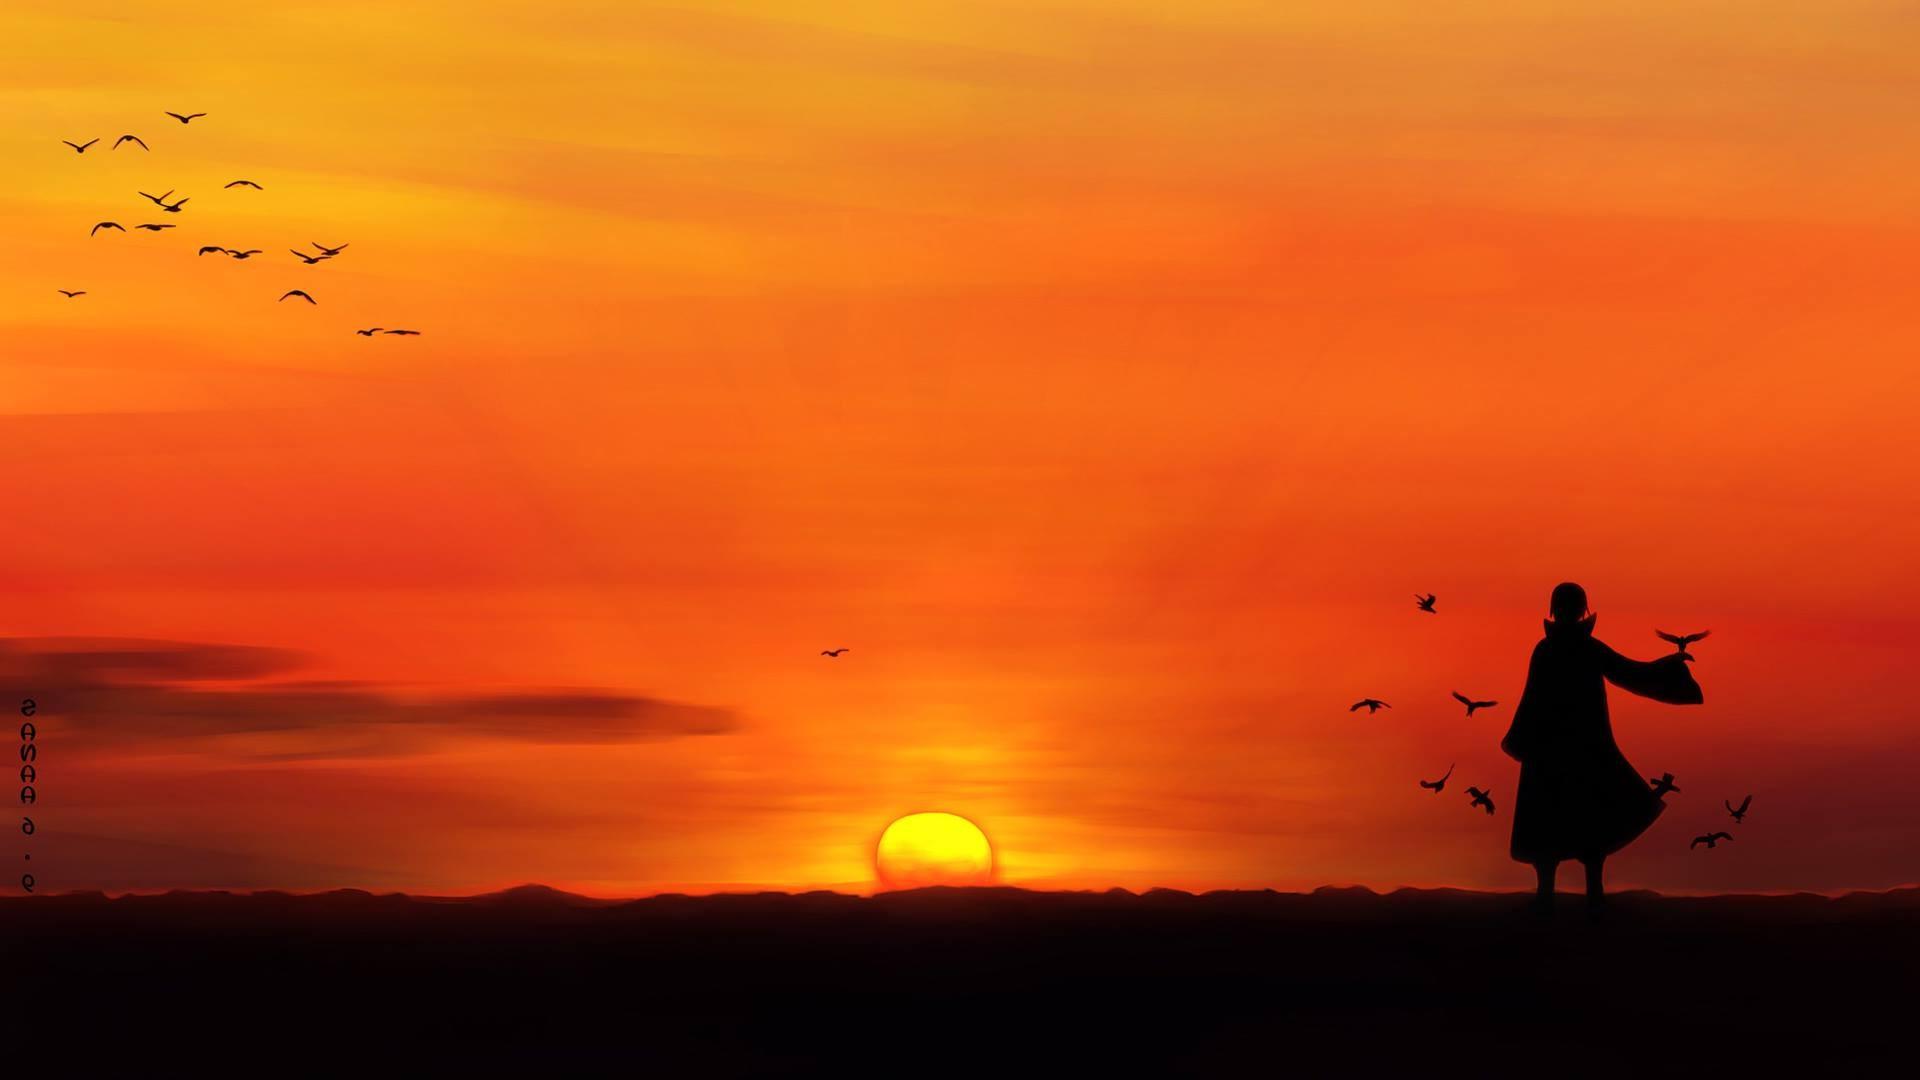 wallpaper : 1920x1080 px, anime, birds, silhouette, sunset, uchiha